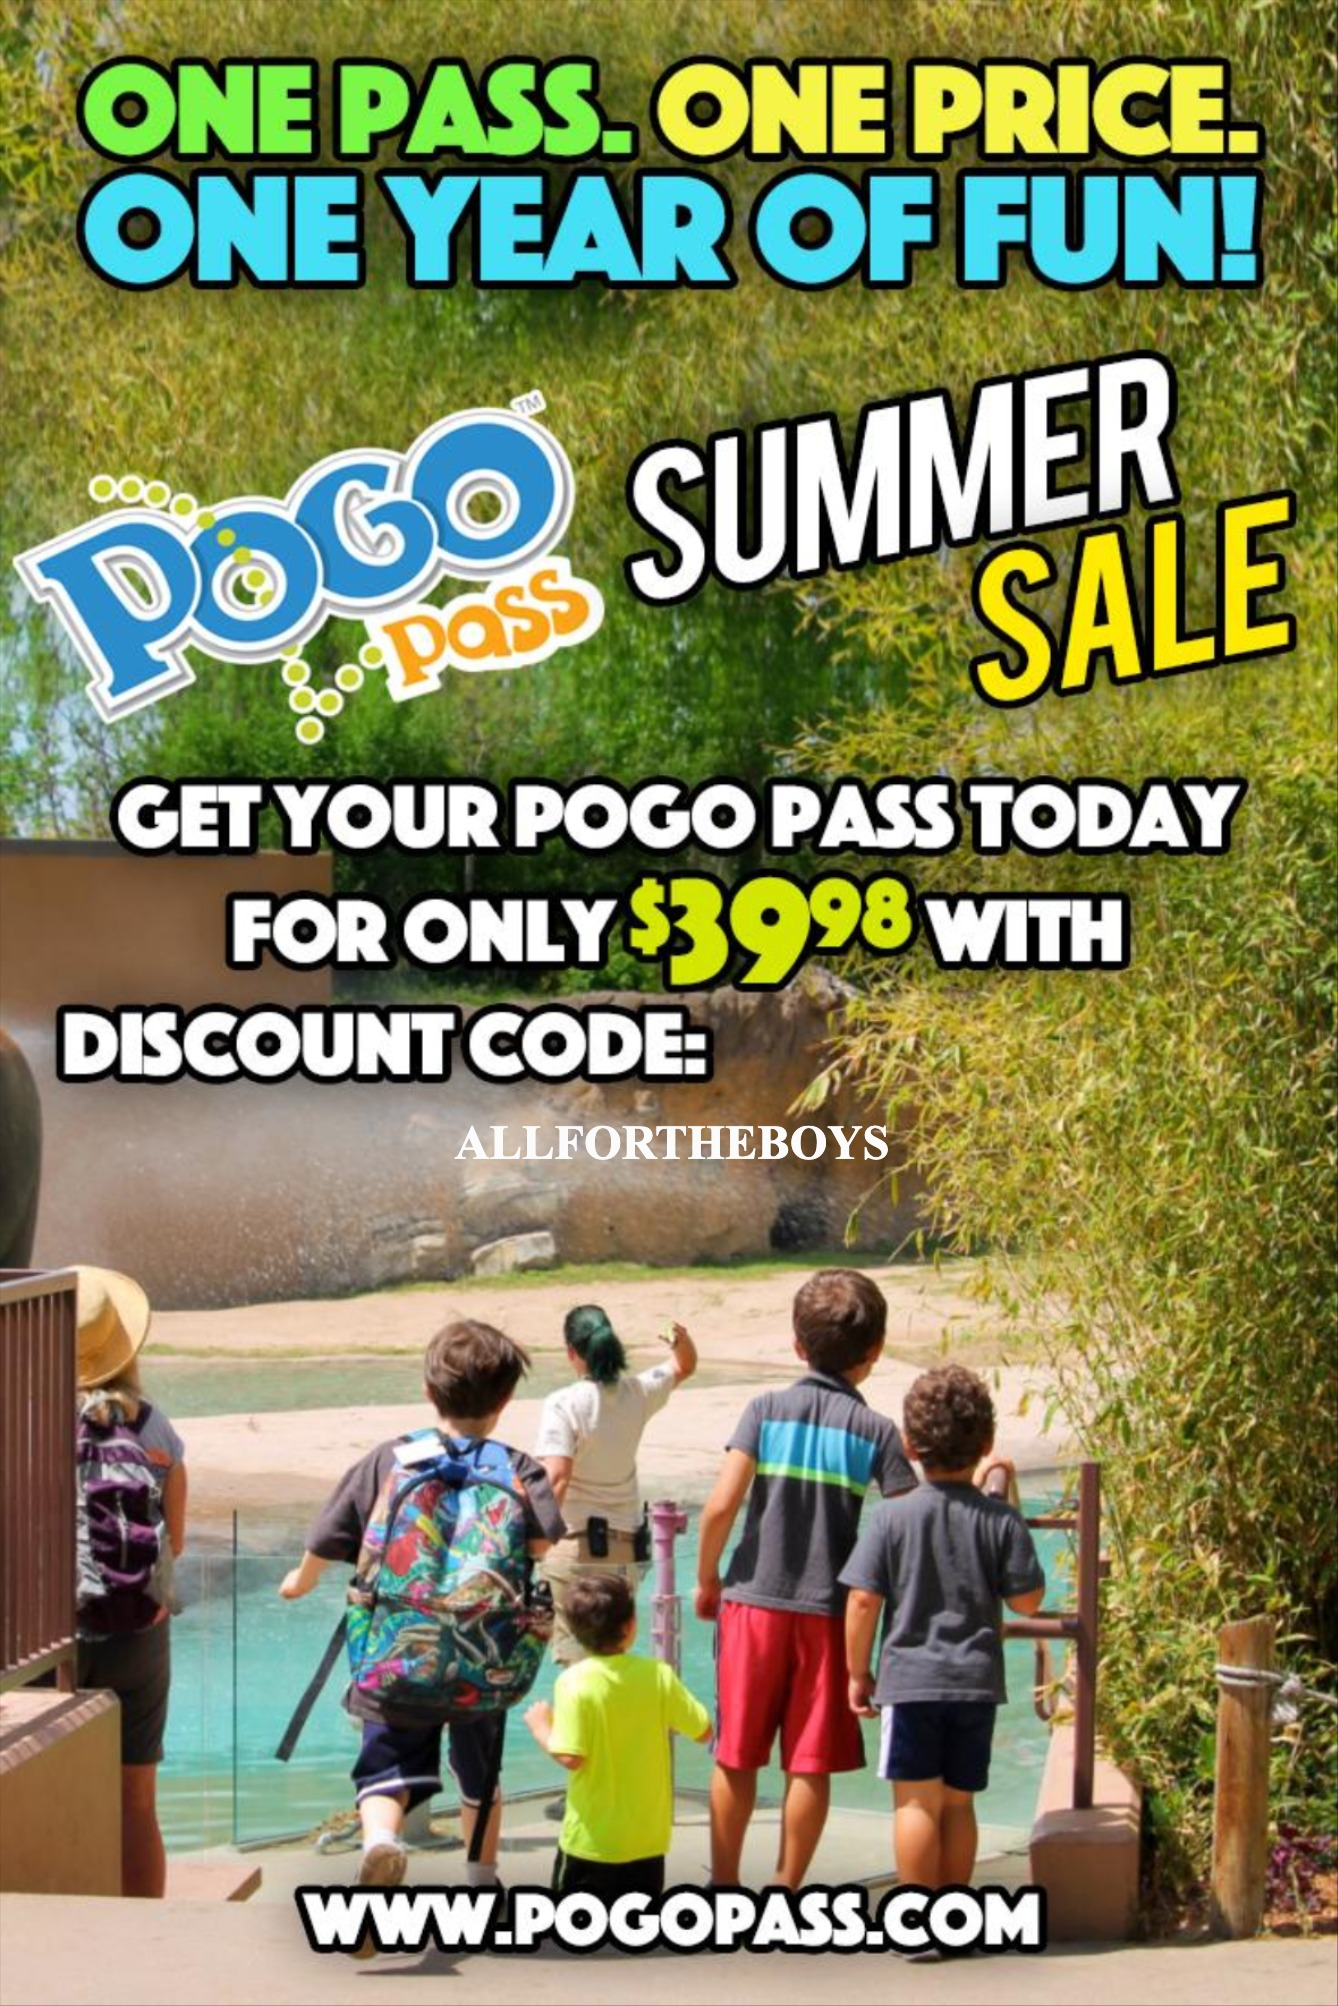 POGO Pass $10 discount promo code!